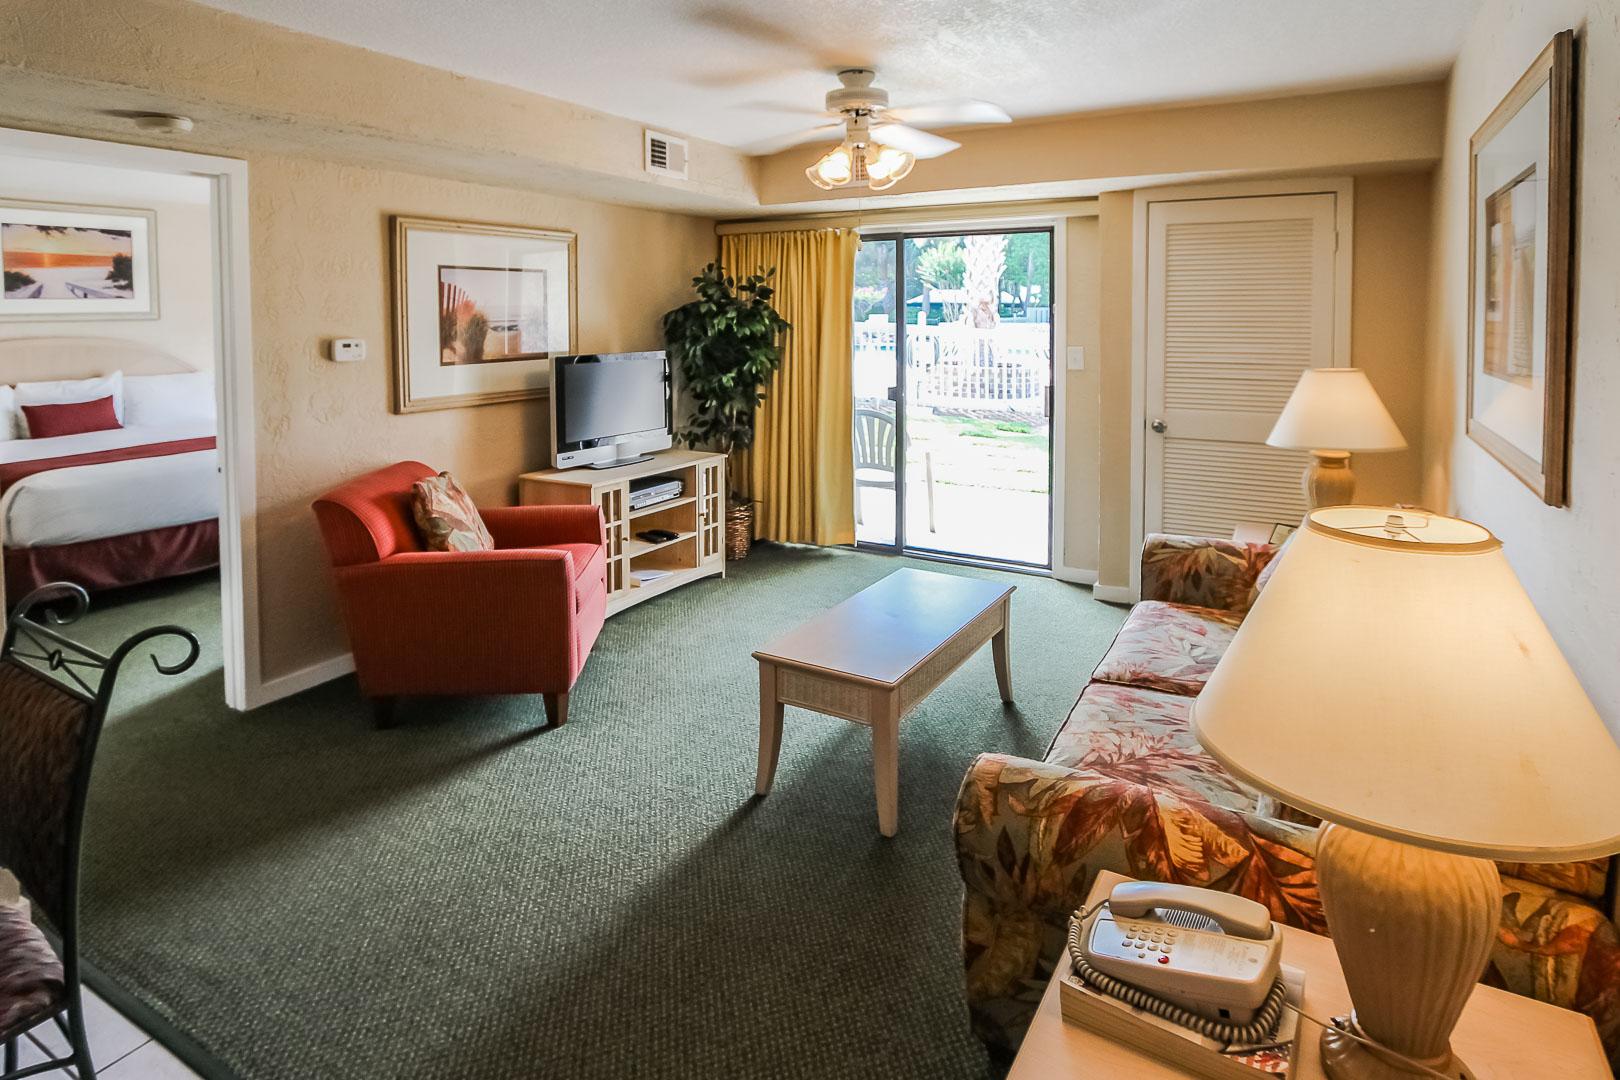 A spacious living room area at VRI's Players Club Resort in Hilton Head Island, South Carolina.